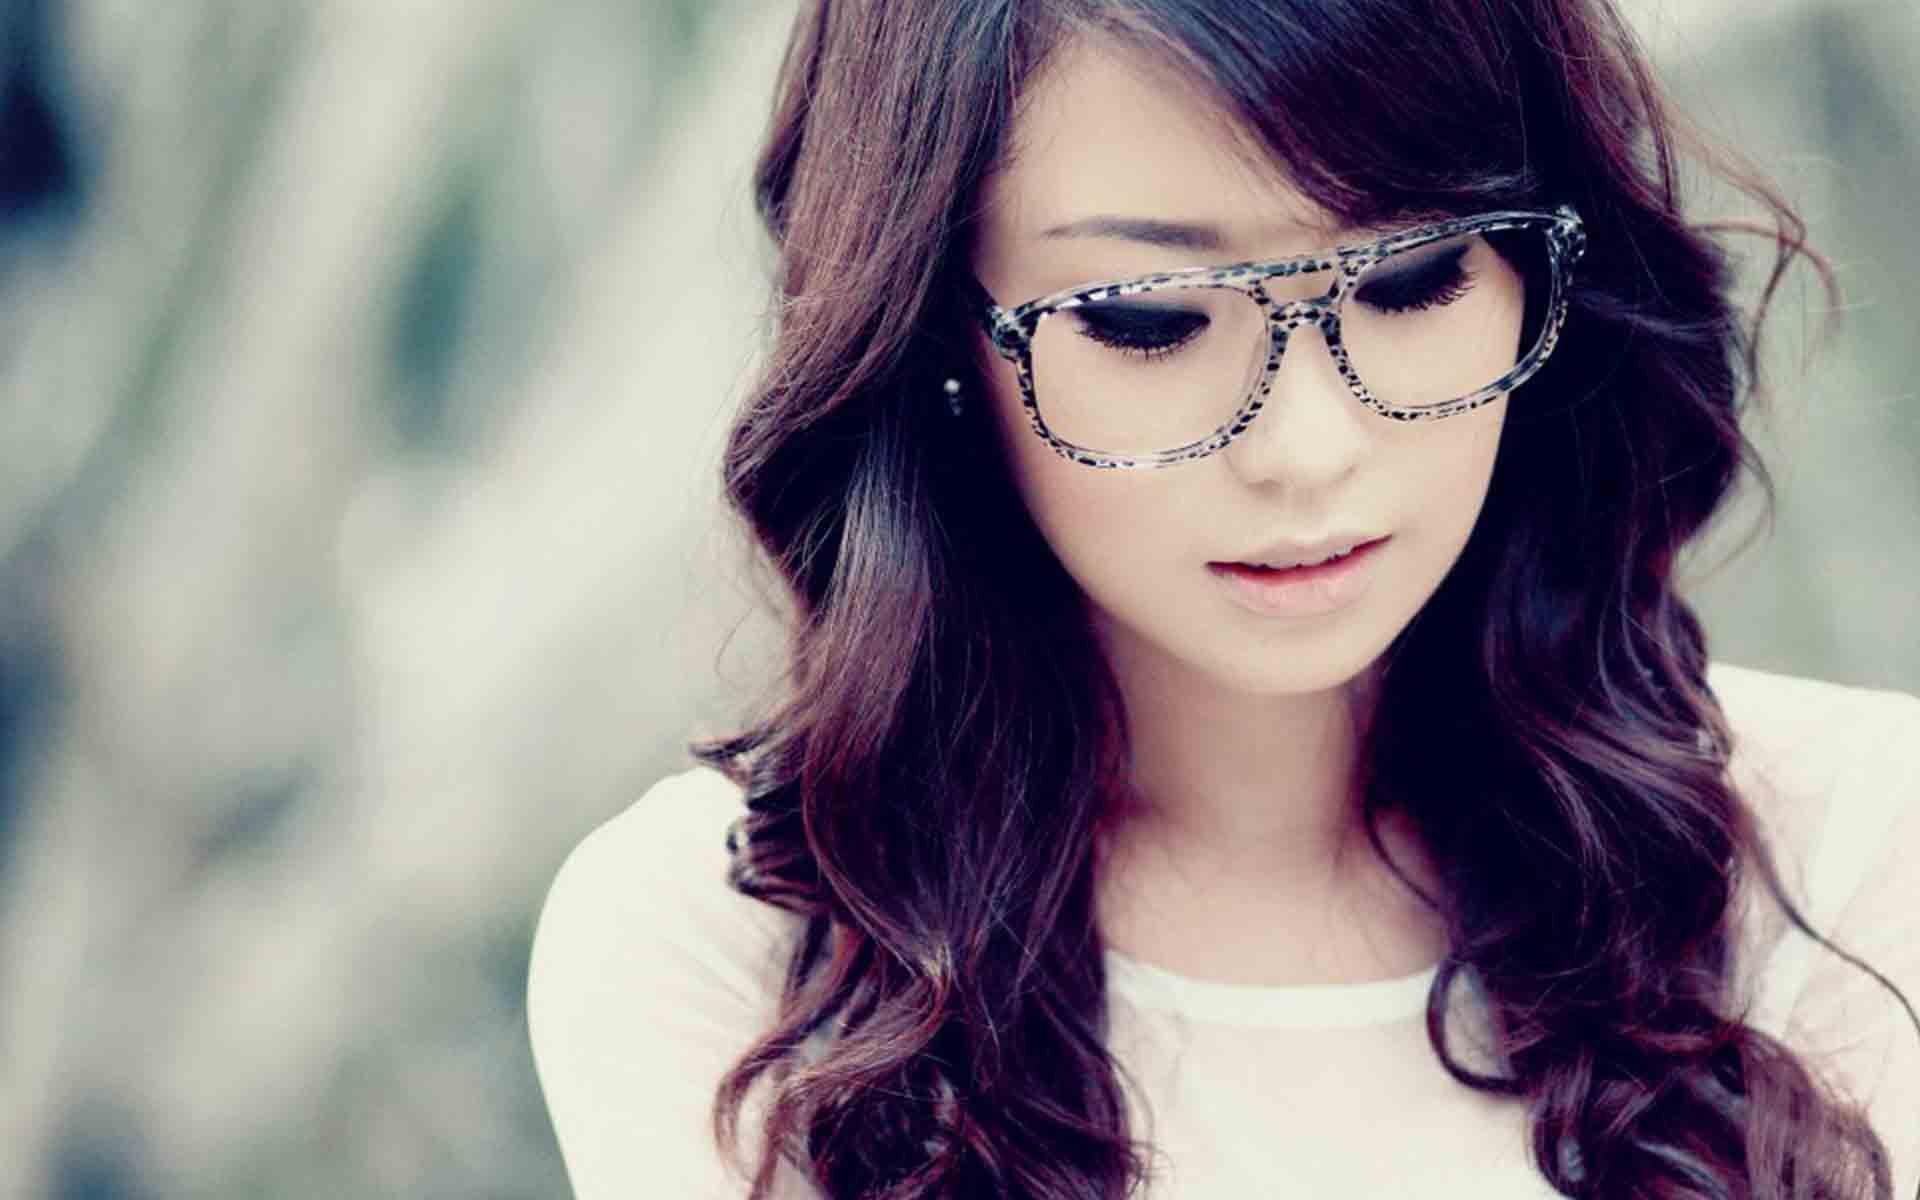 cute girl wallpaper - sf wallpaper